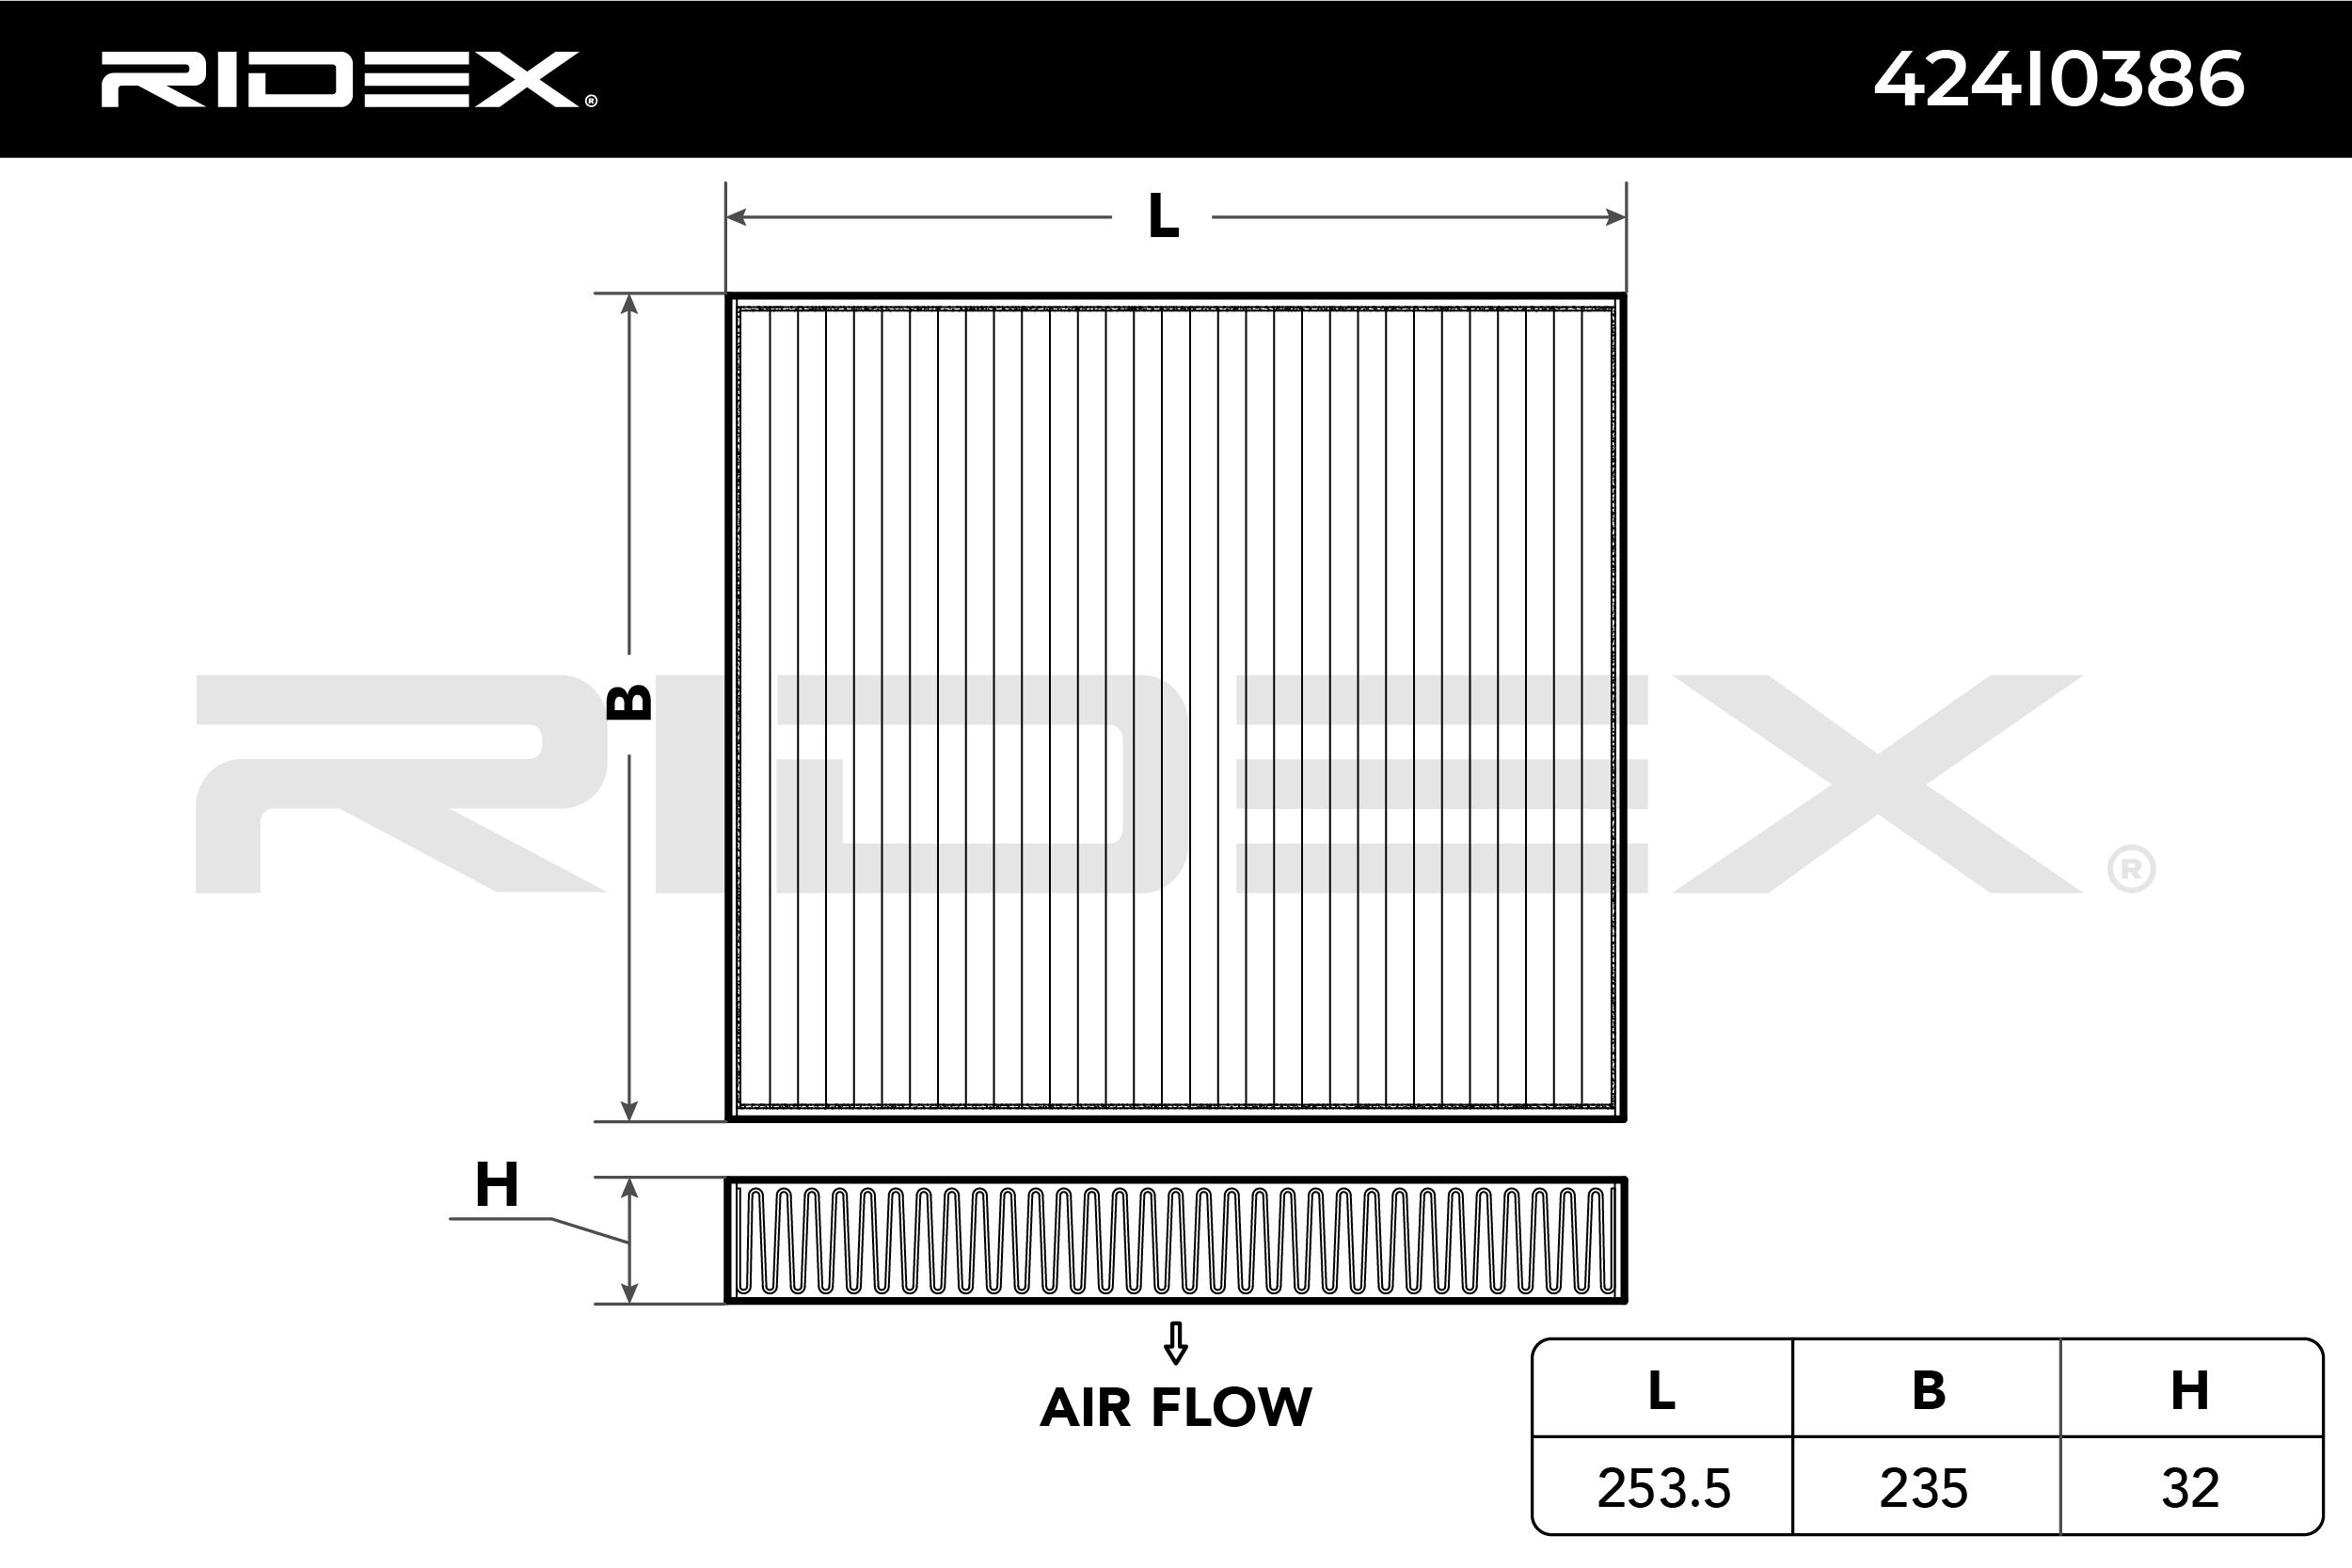 Staubfilter RIDEX 424I0386 Erfahrung